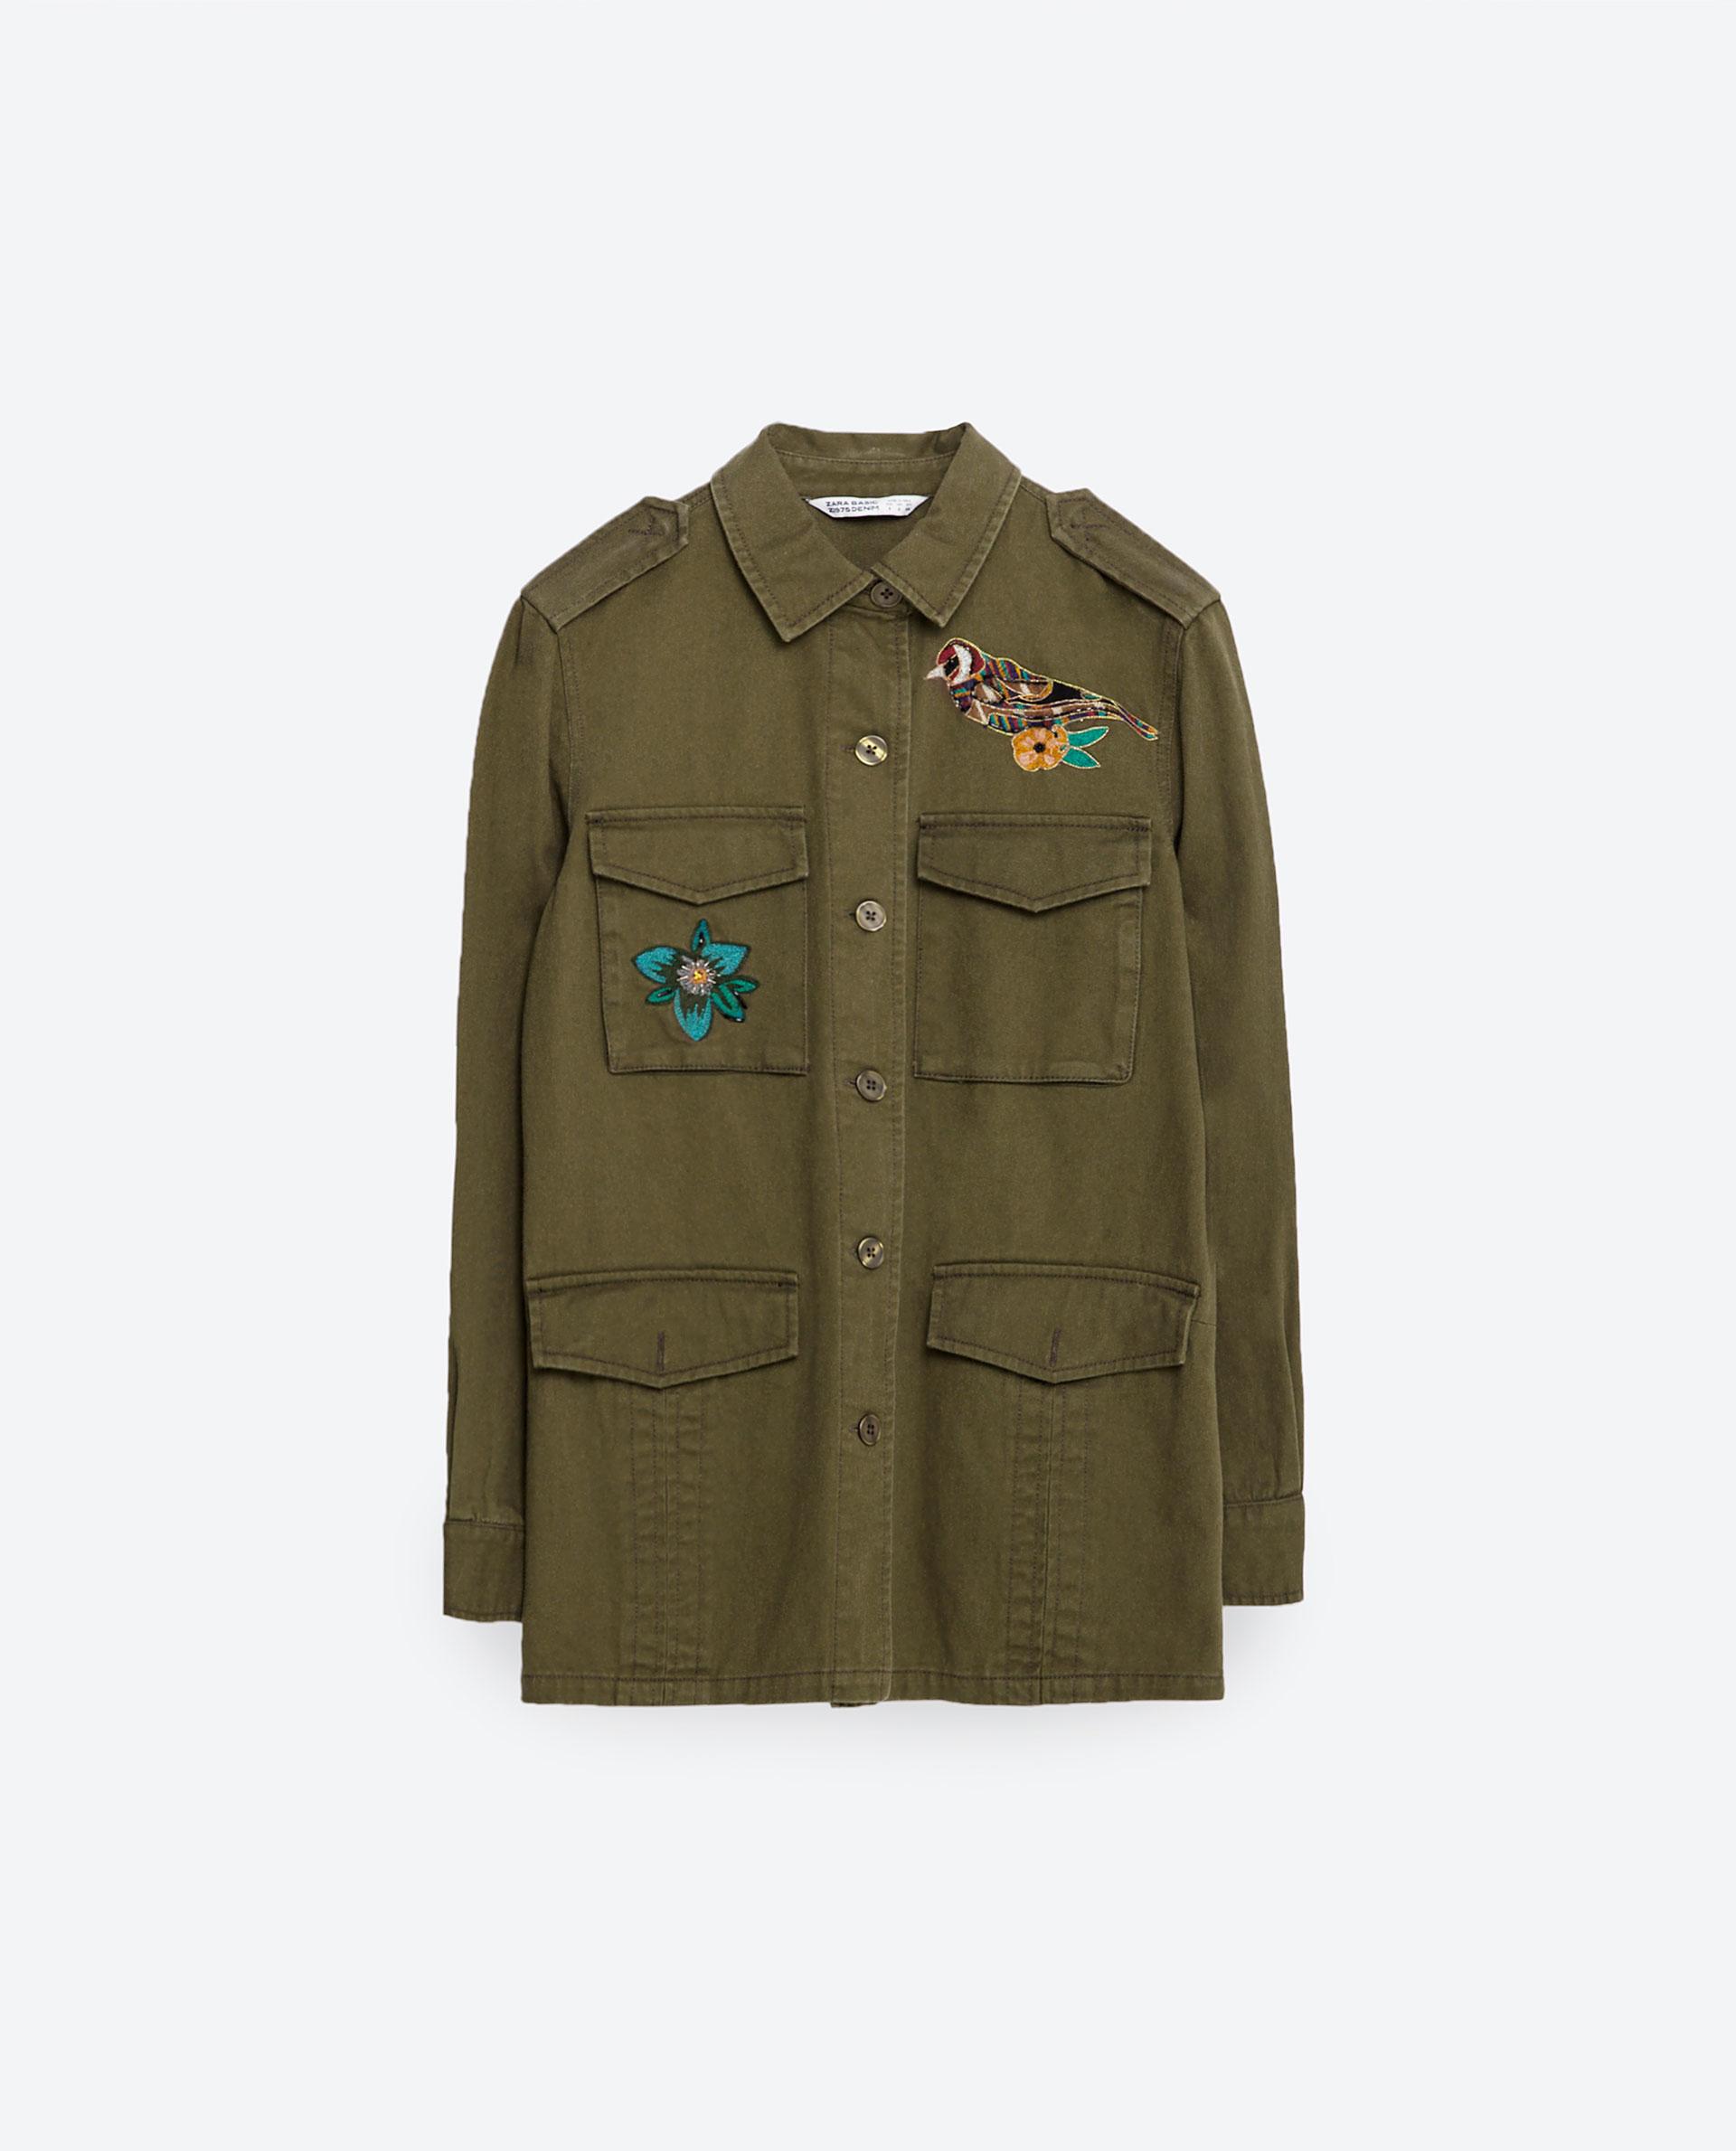 New embroidered jacket zara makaroka